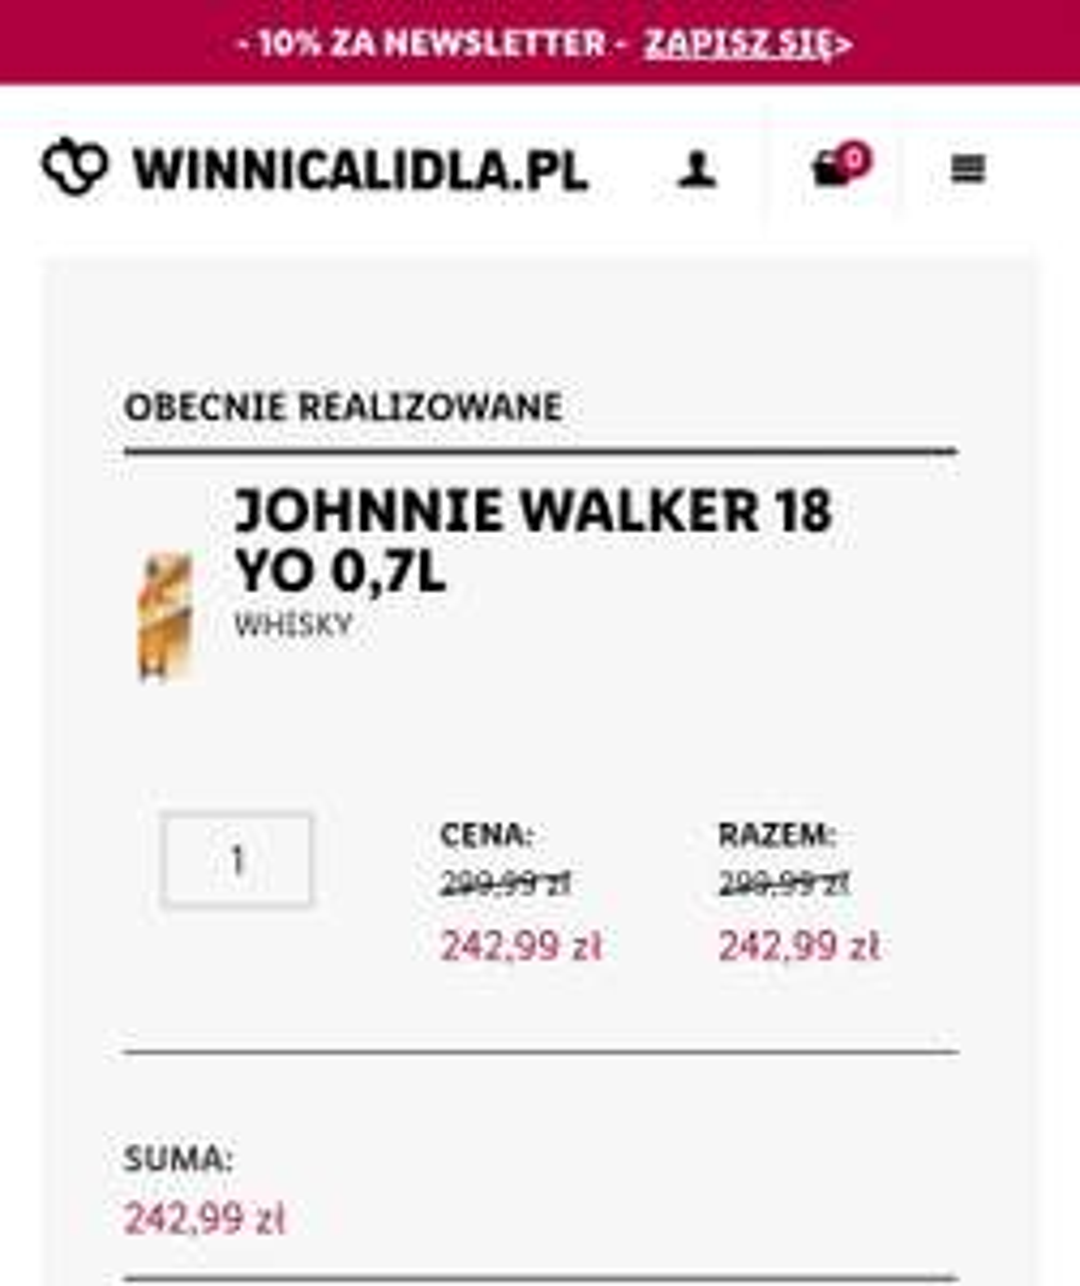 Johnnie walker 18 YO 0,7l - winnica lidla